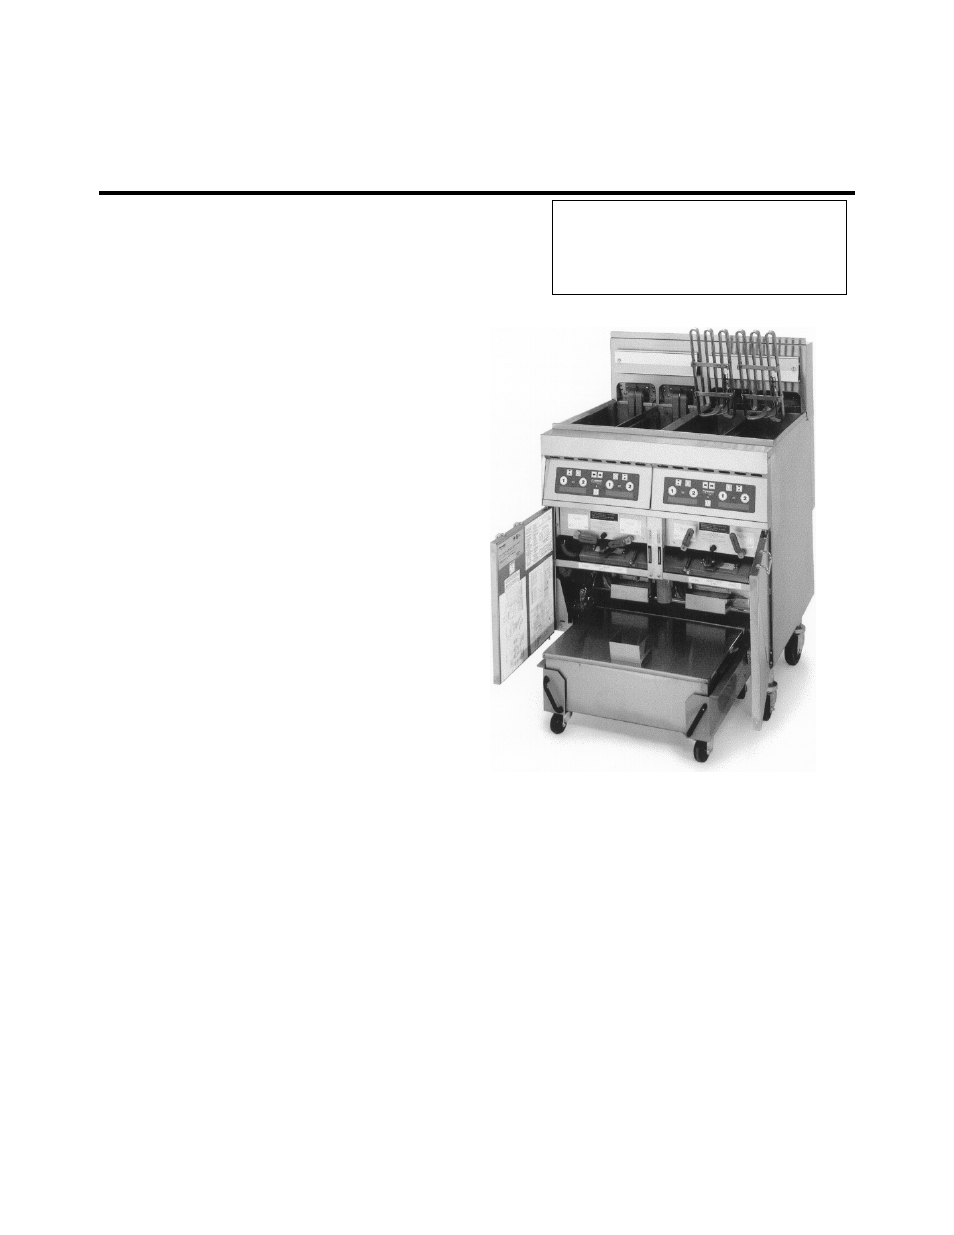 Frymaster H14 Parts Manual Good Owner Guide Website Imperial Fryer Wiring Diagram Series User 110 Pages Rh Manualsdir Com